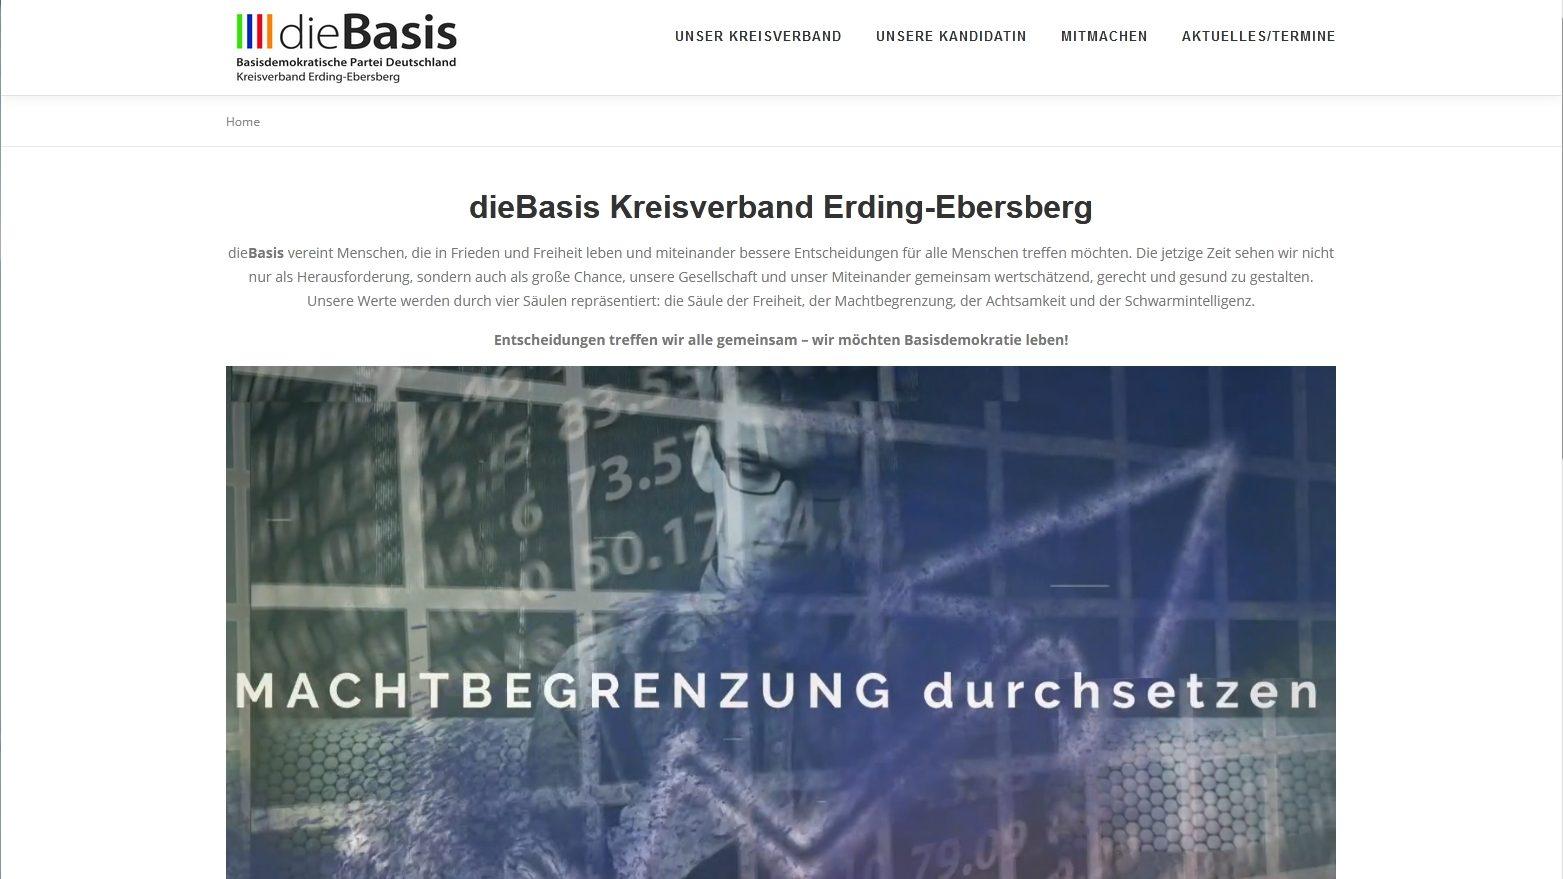 KV Erding-Ebersberg